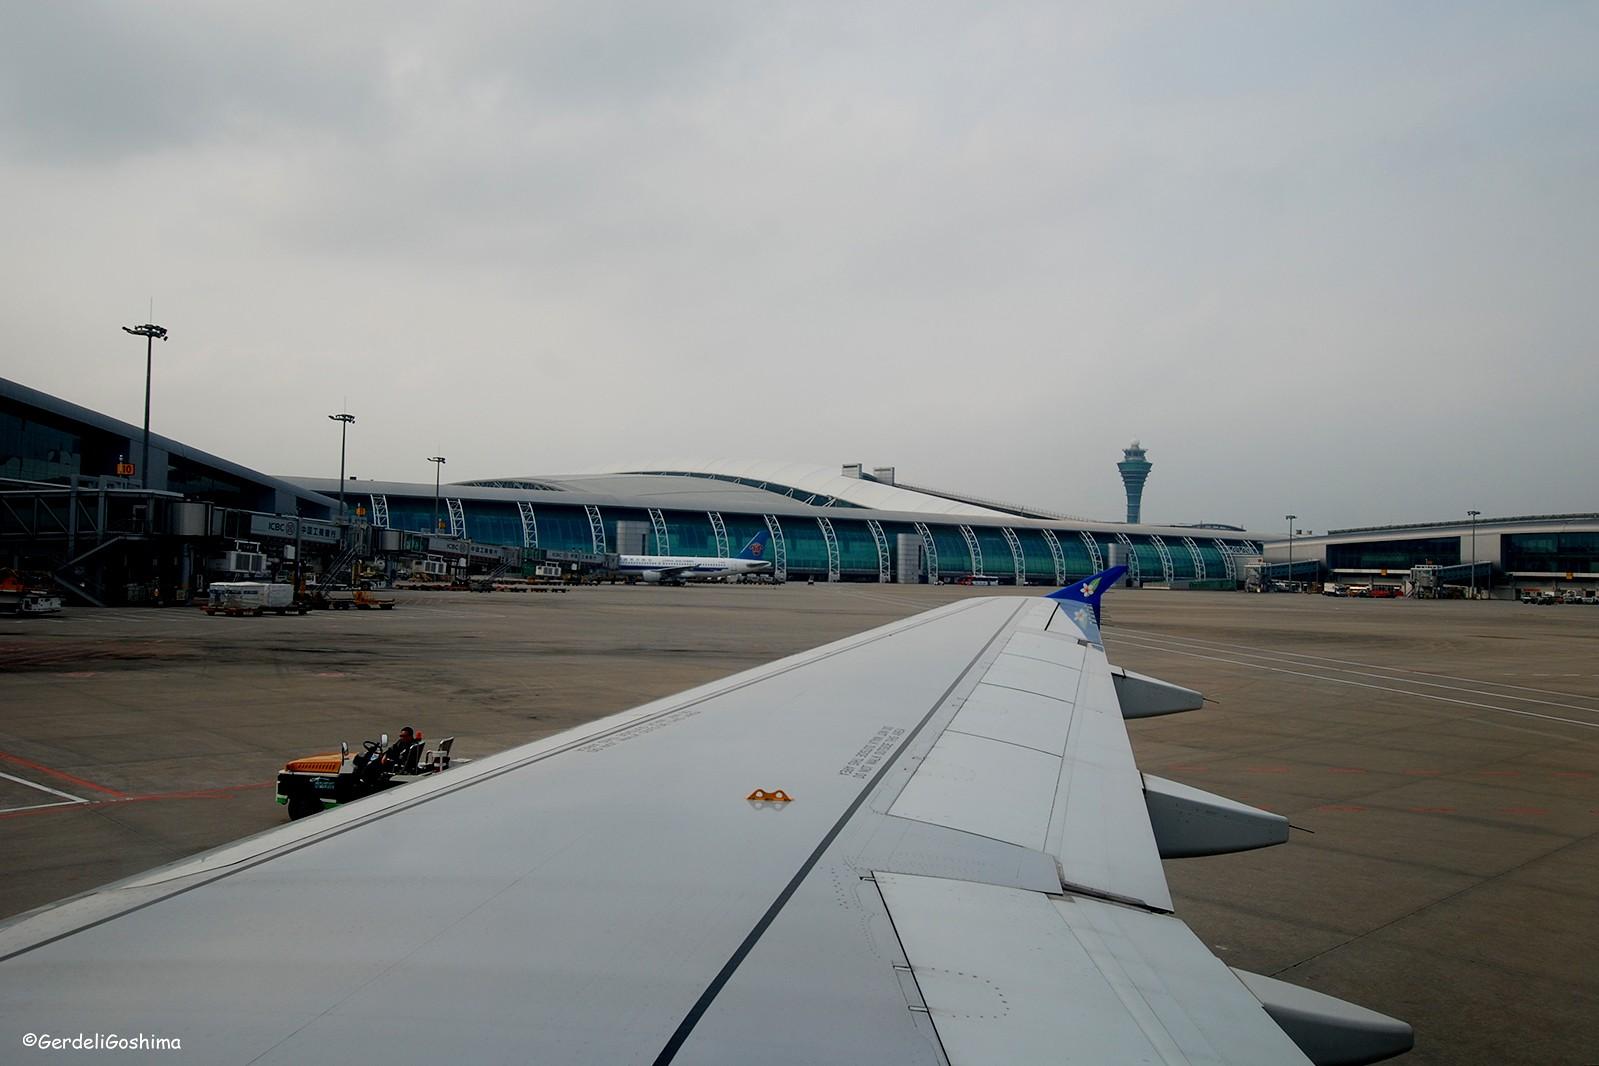 Re:[AB6原创] 首次搭乘老挝航空,四飞游历老挝,附风景图(1600pix) AIRBUS A320-214 RDPL-34223 老挝万象瓦岱机场